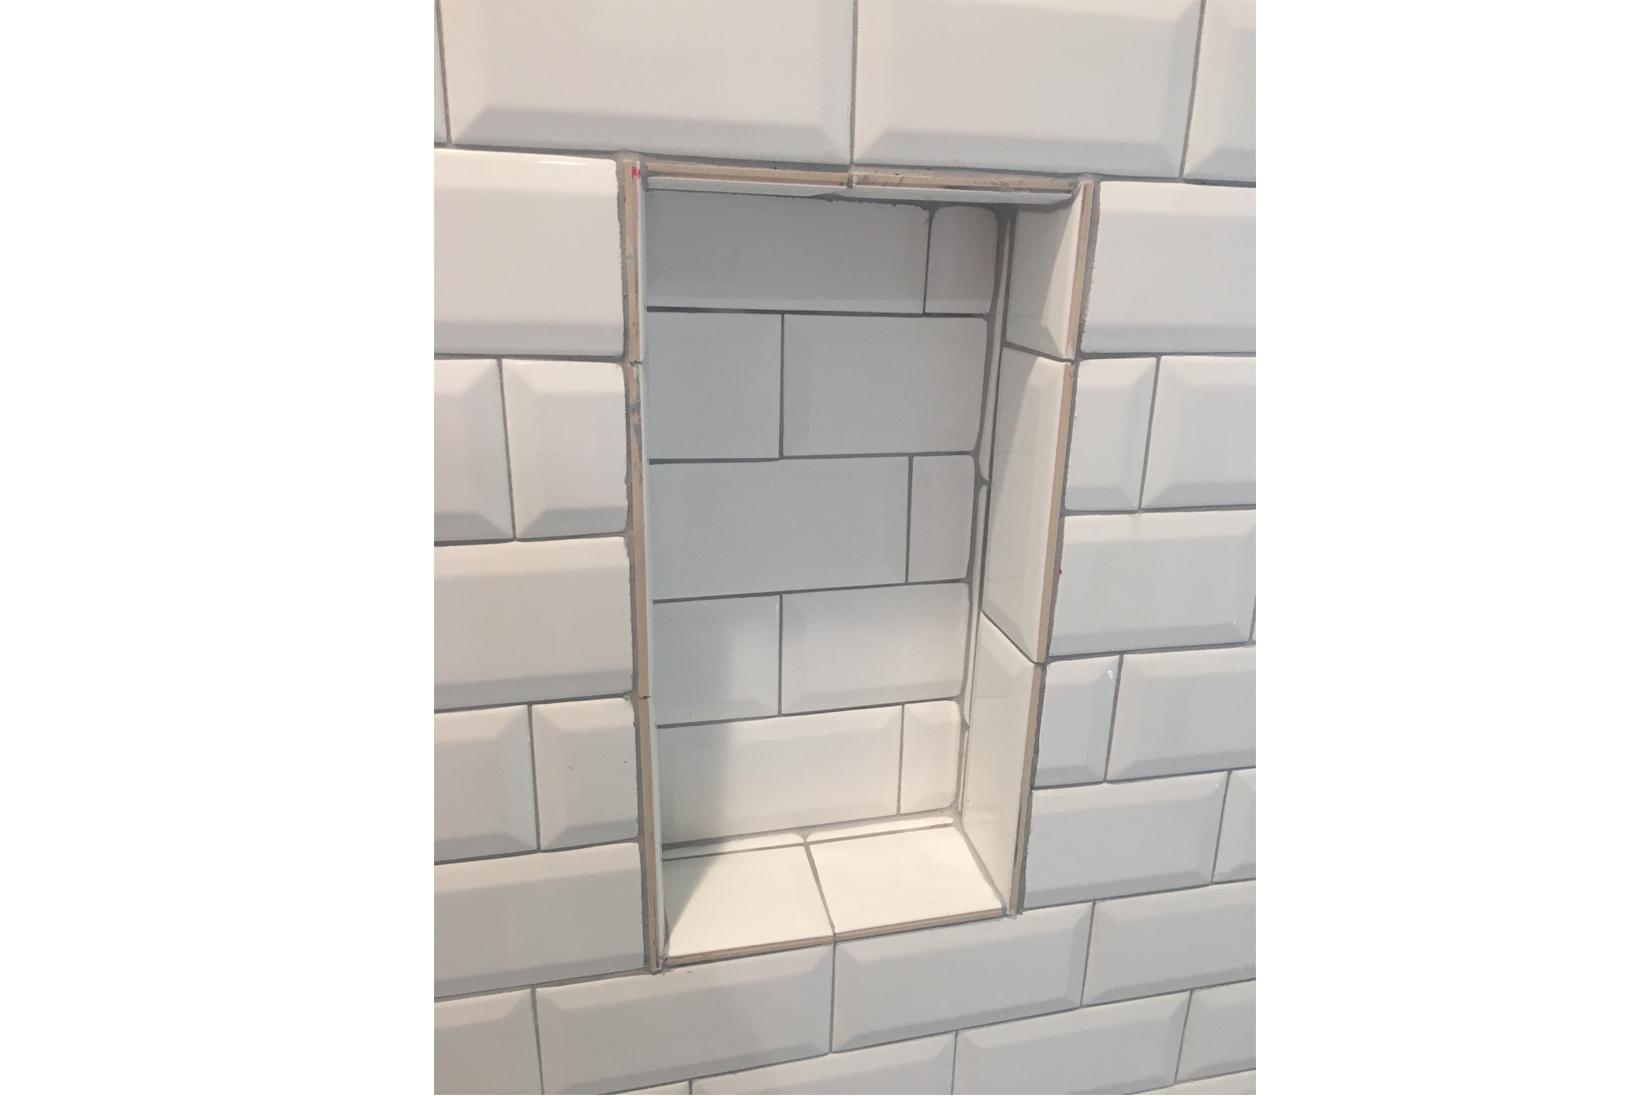 detail hacks the shower niche a new